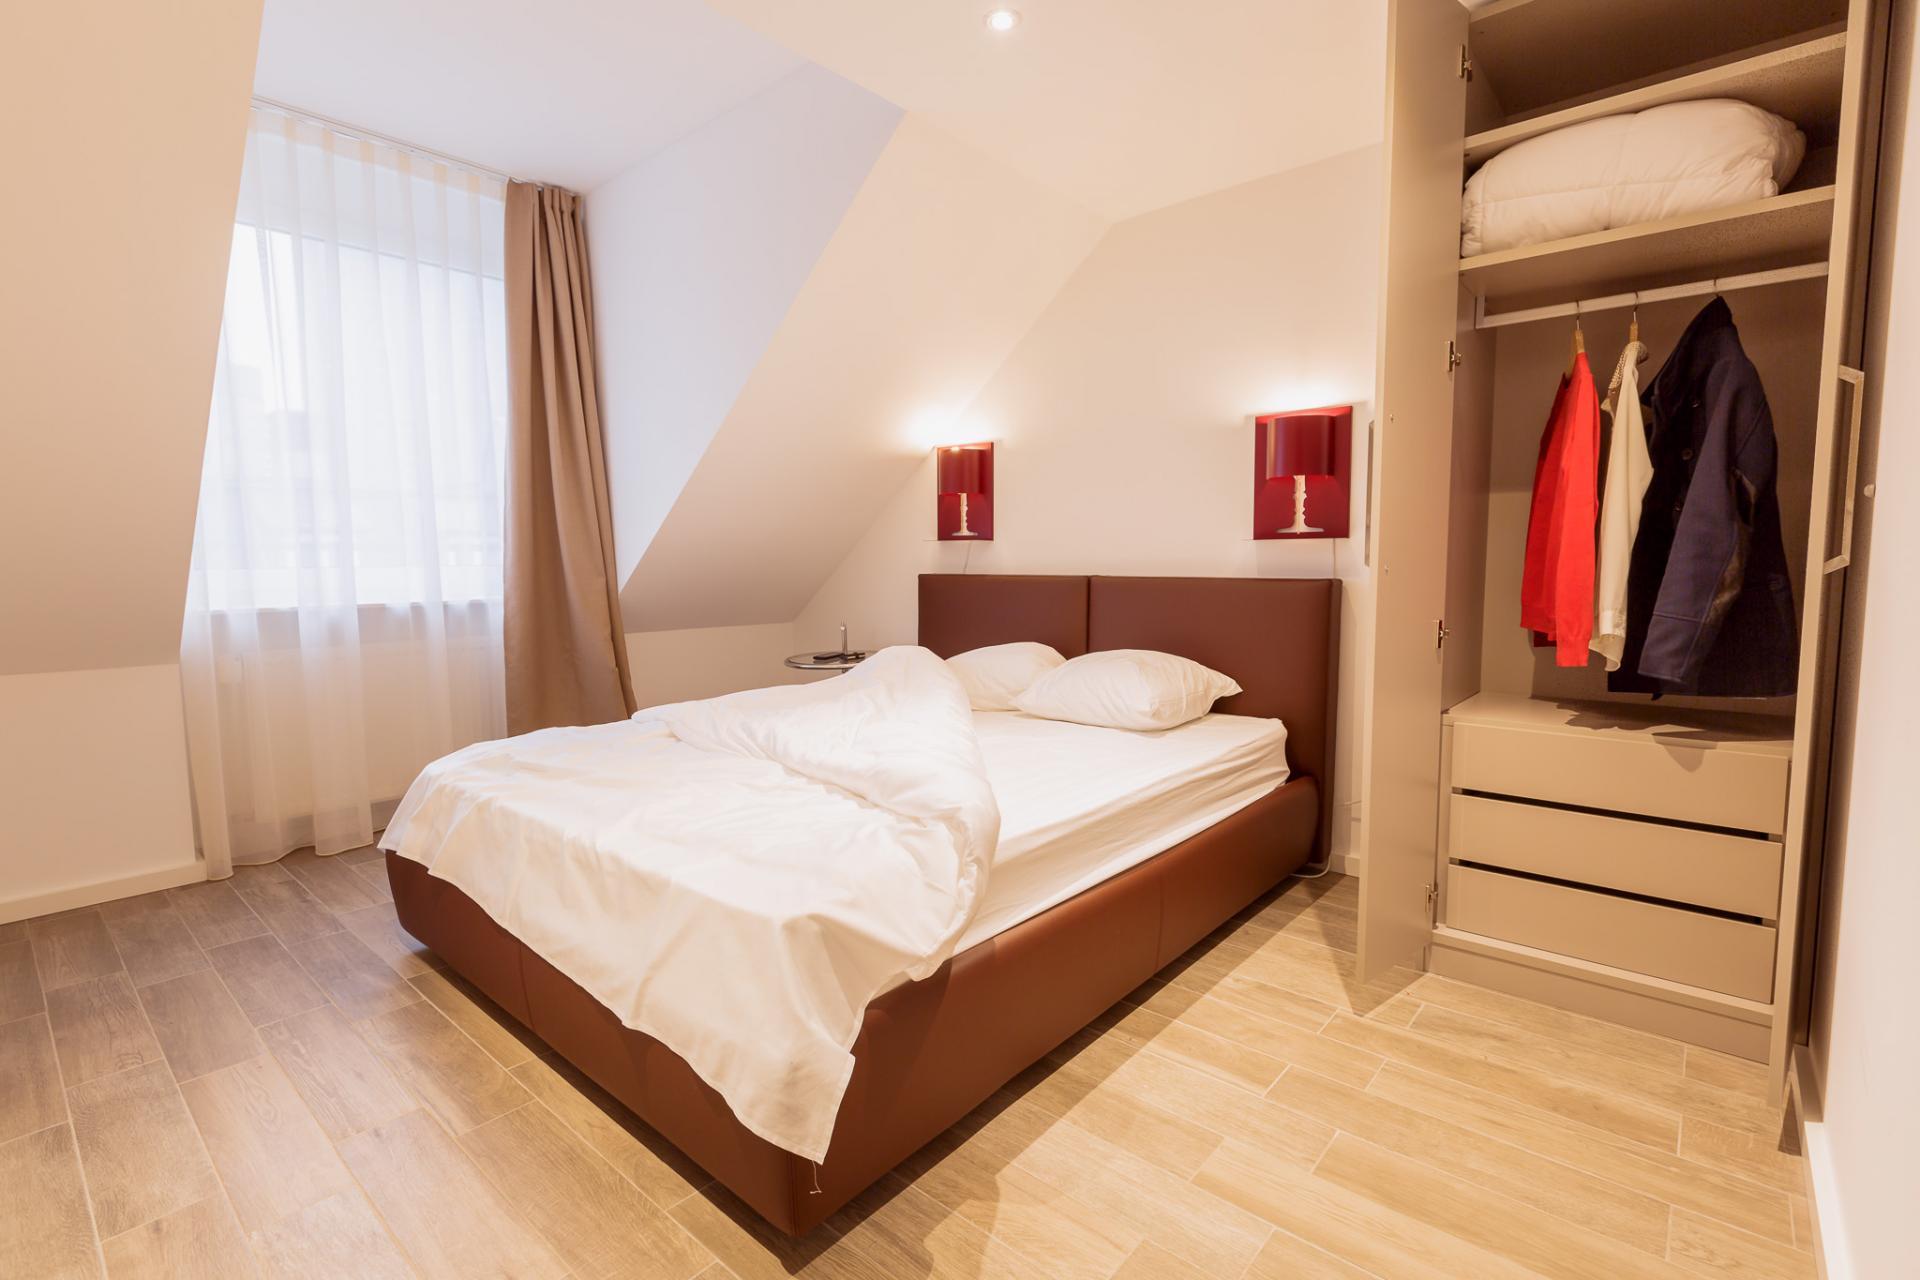 Bed at Brera Elbestrasse 29 - Citybase Apartments